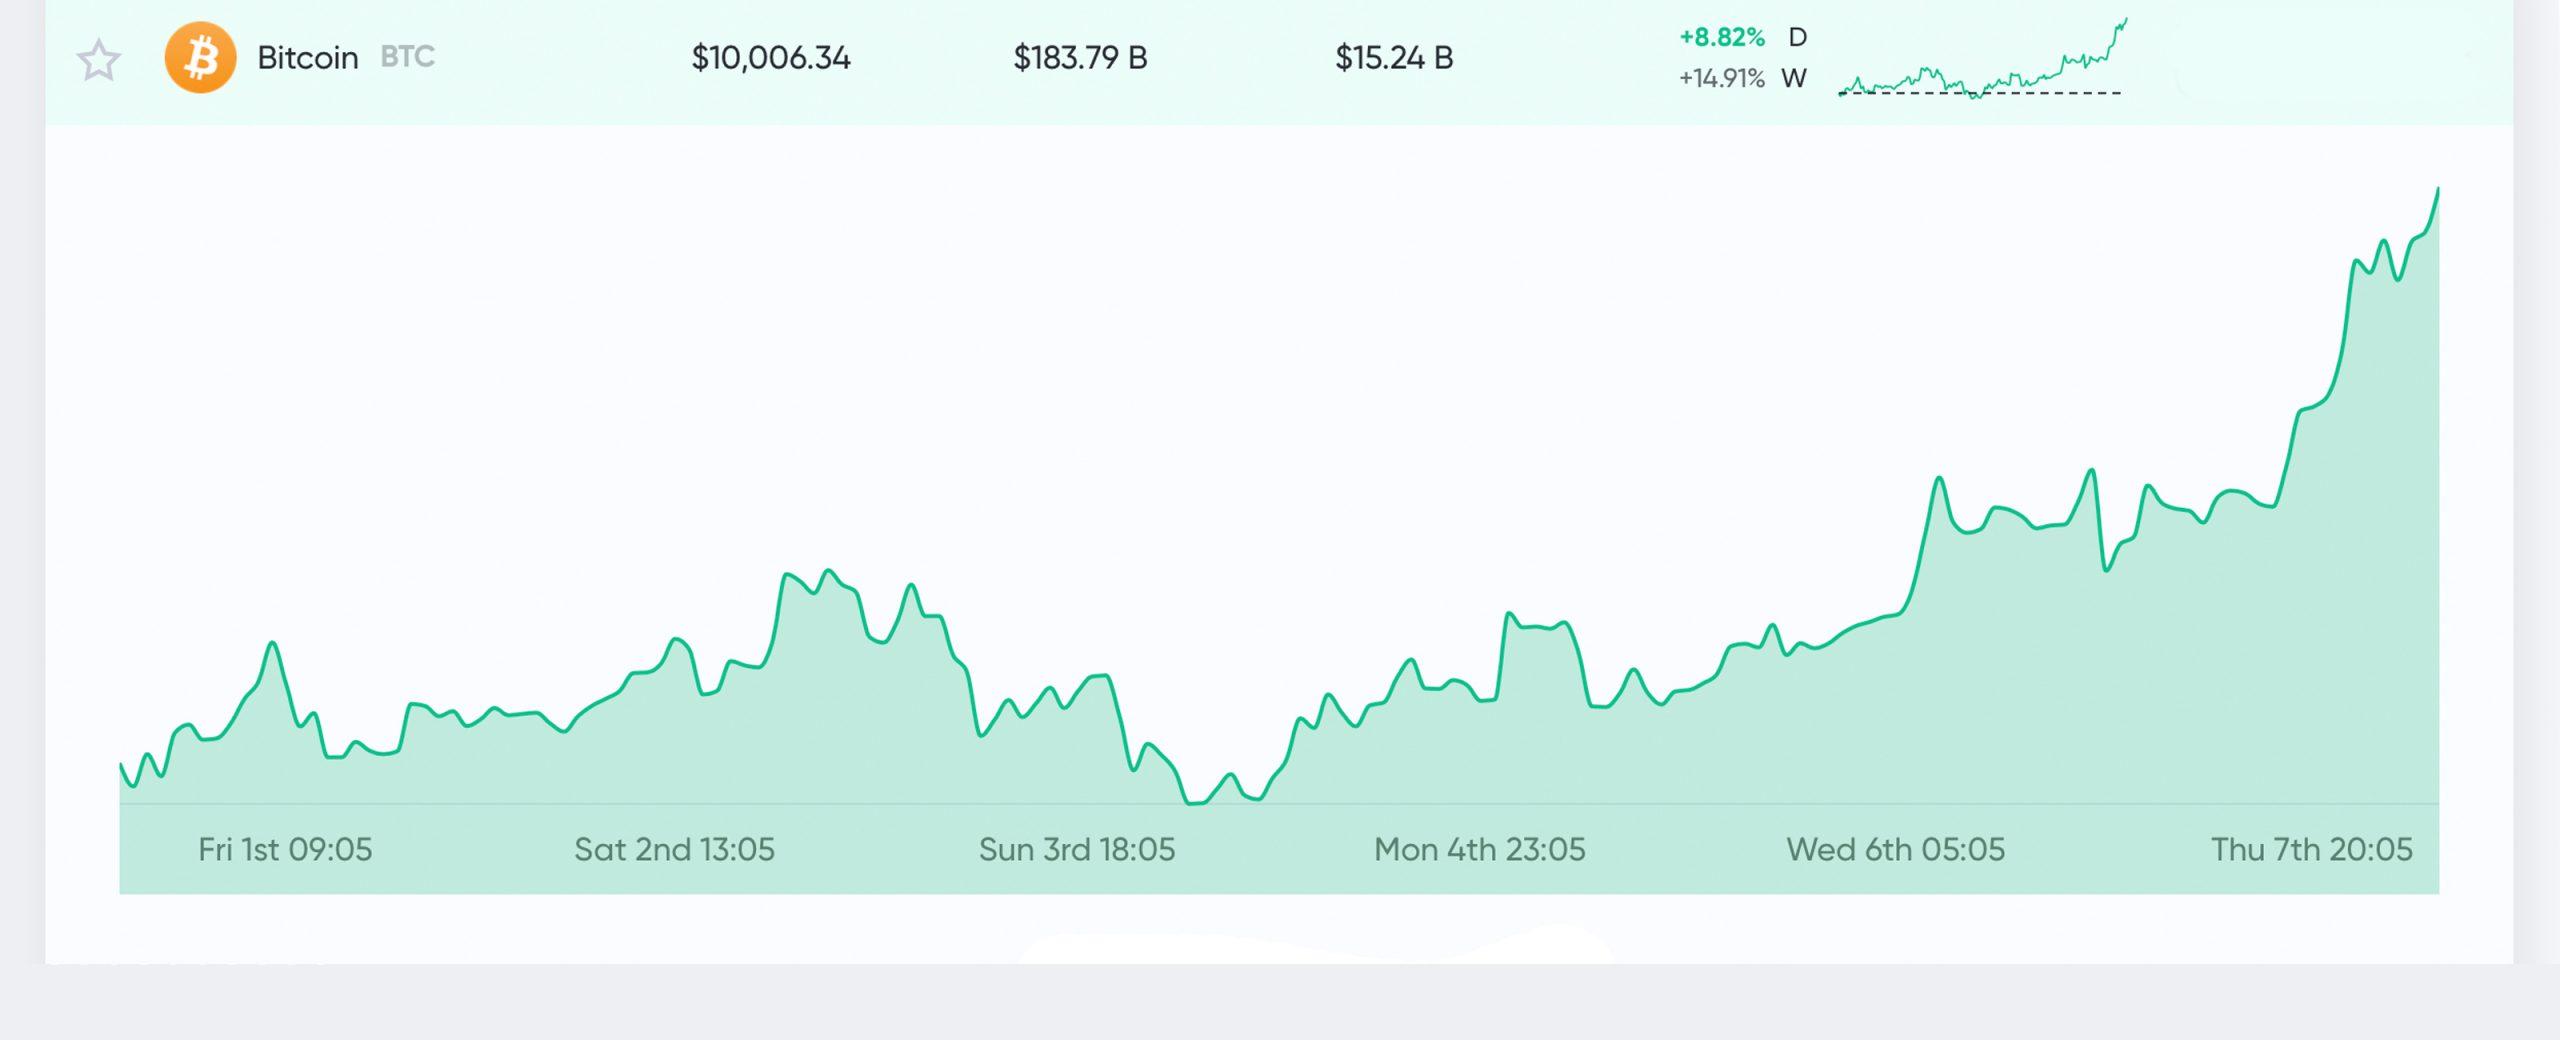 Bitcoin Price Touches $10K Amid 2020